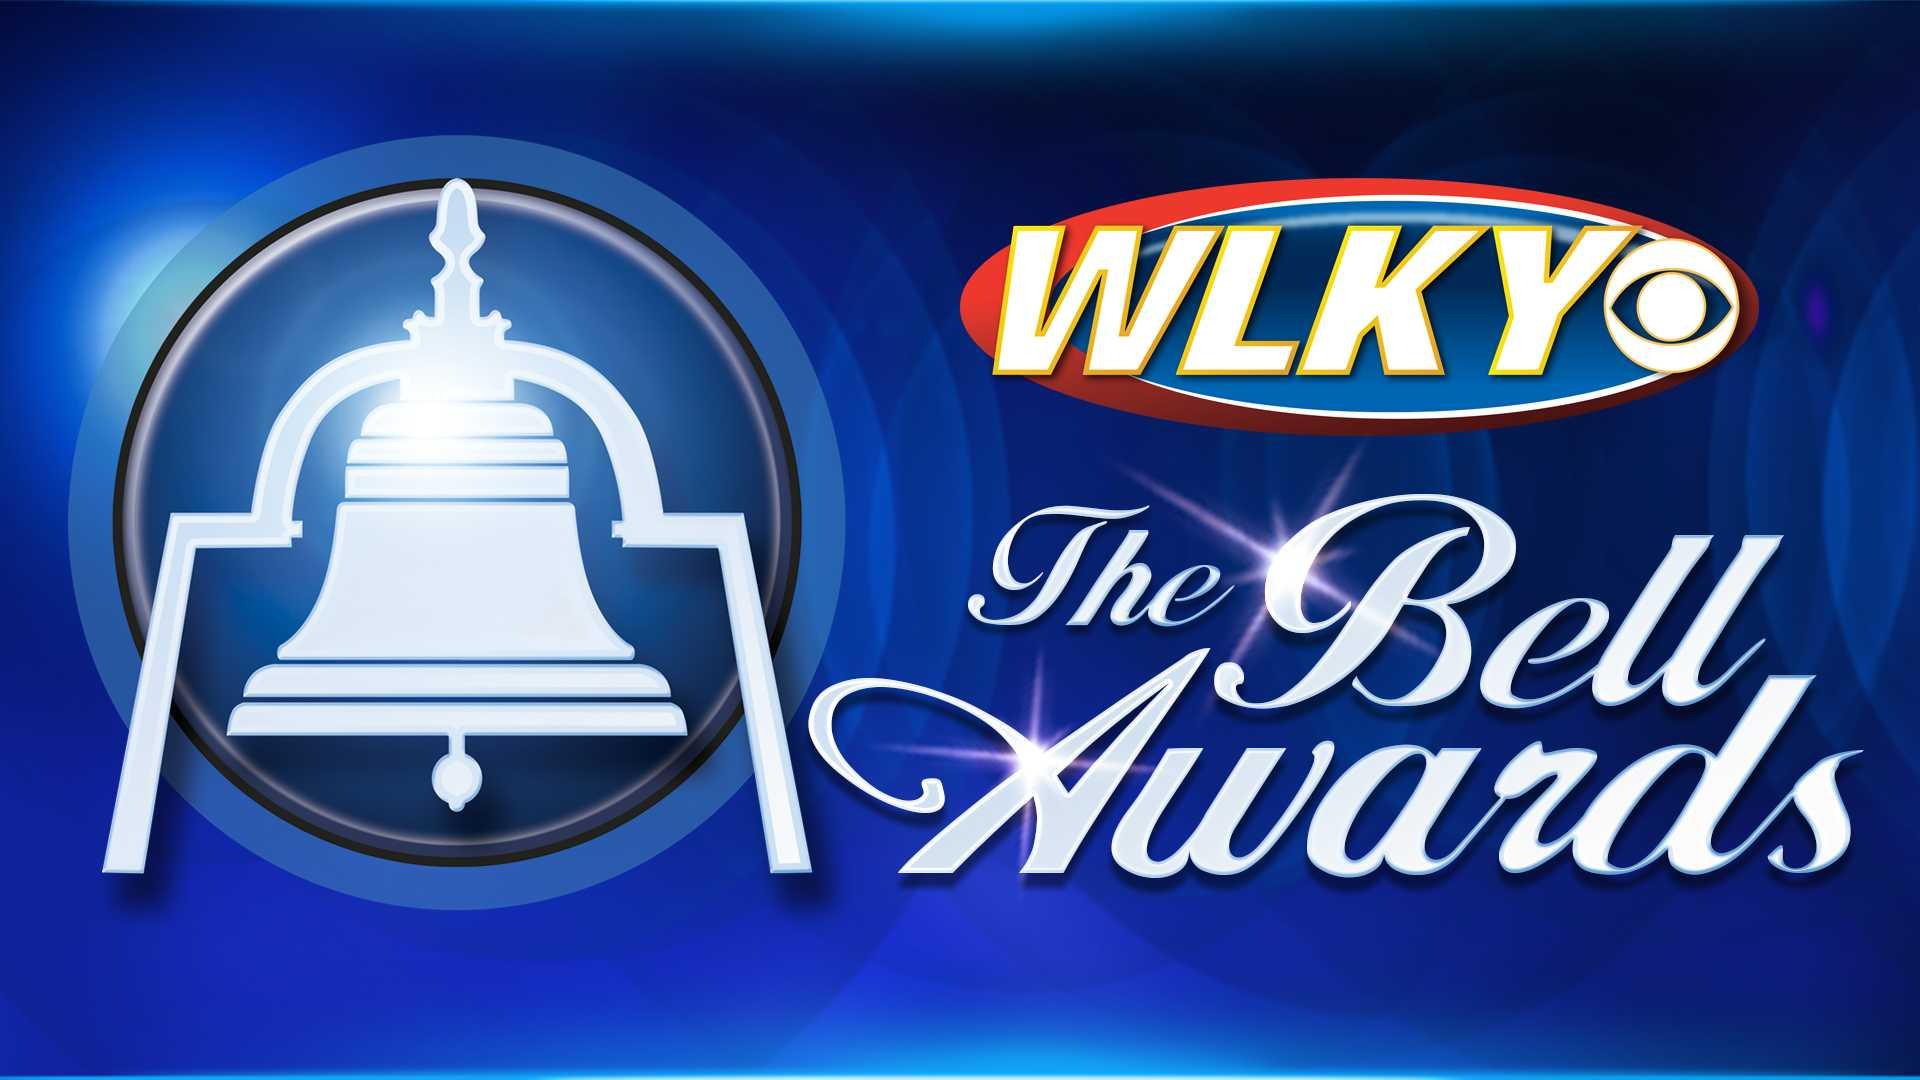 wlky, bell awards, new logo